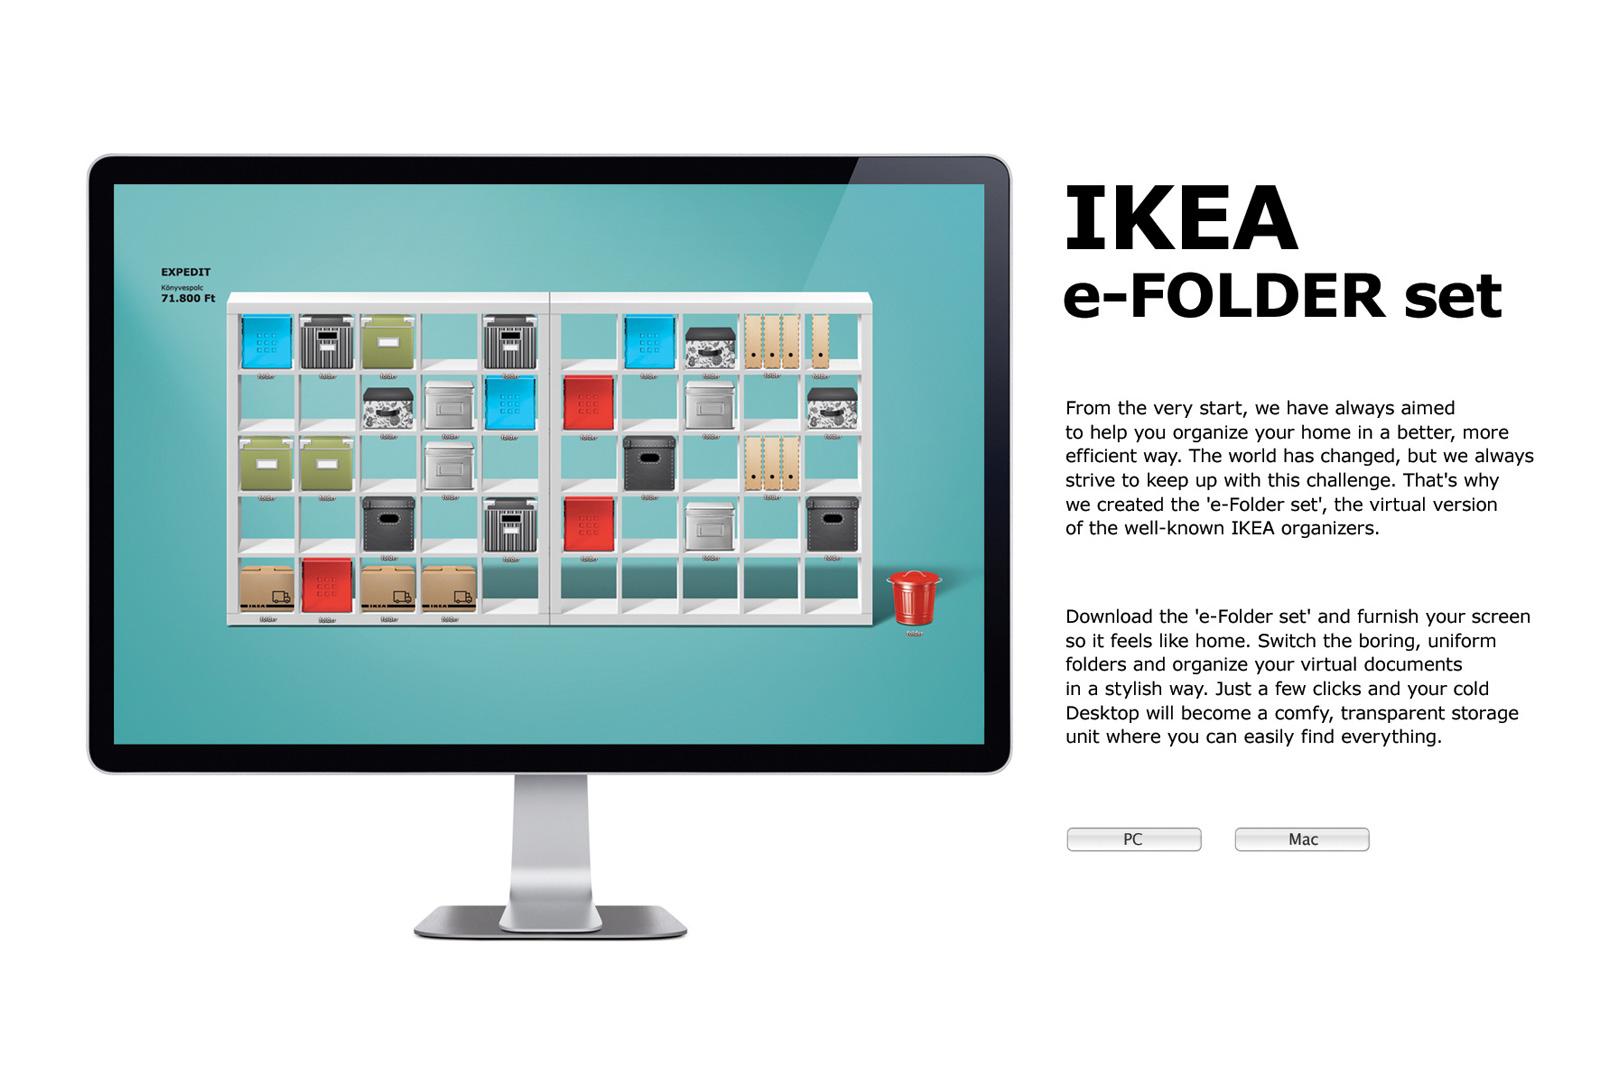 High Quality IKEA Digital Ad   Organize Your Desktop